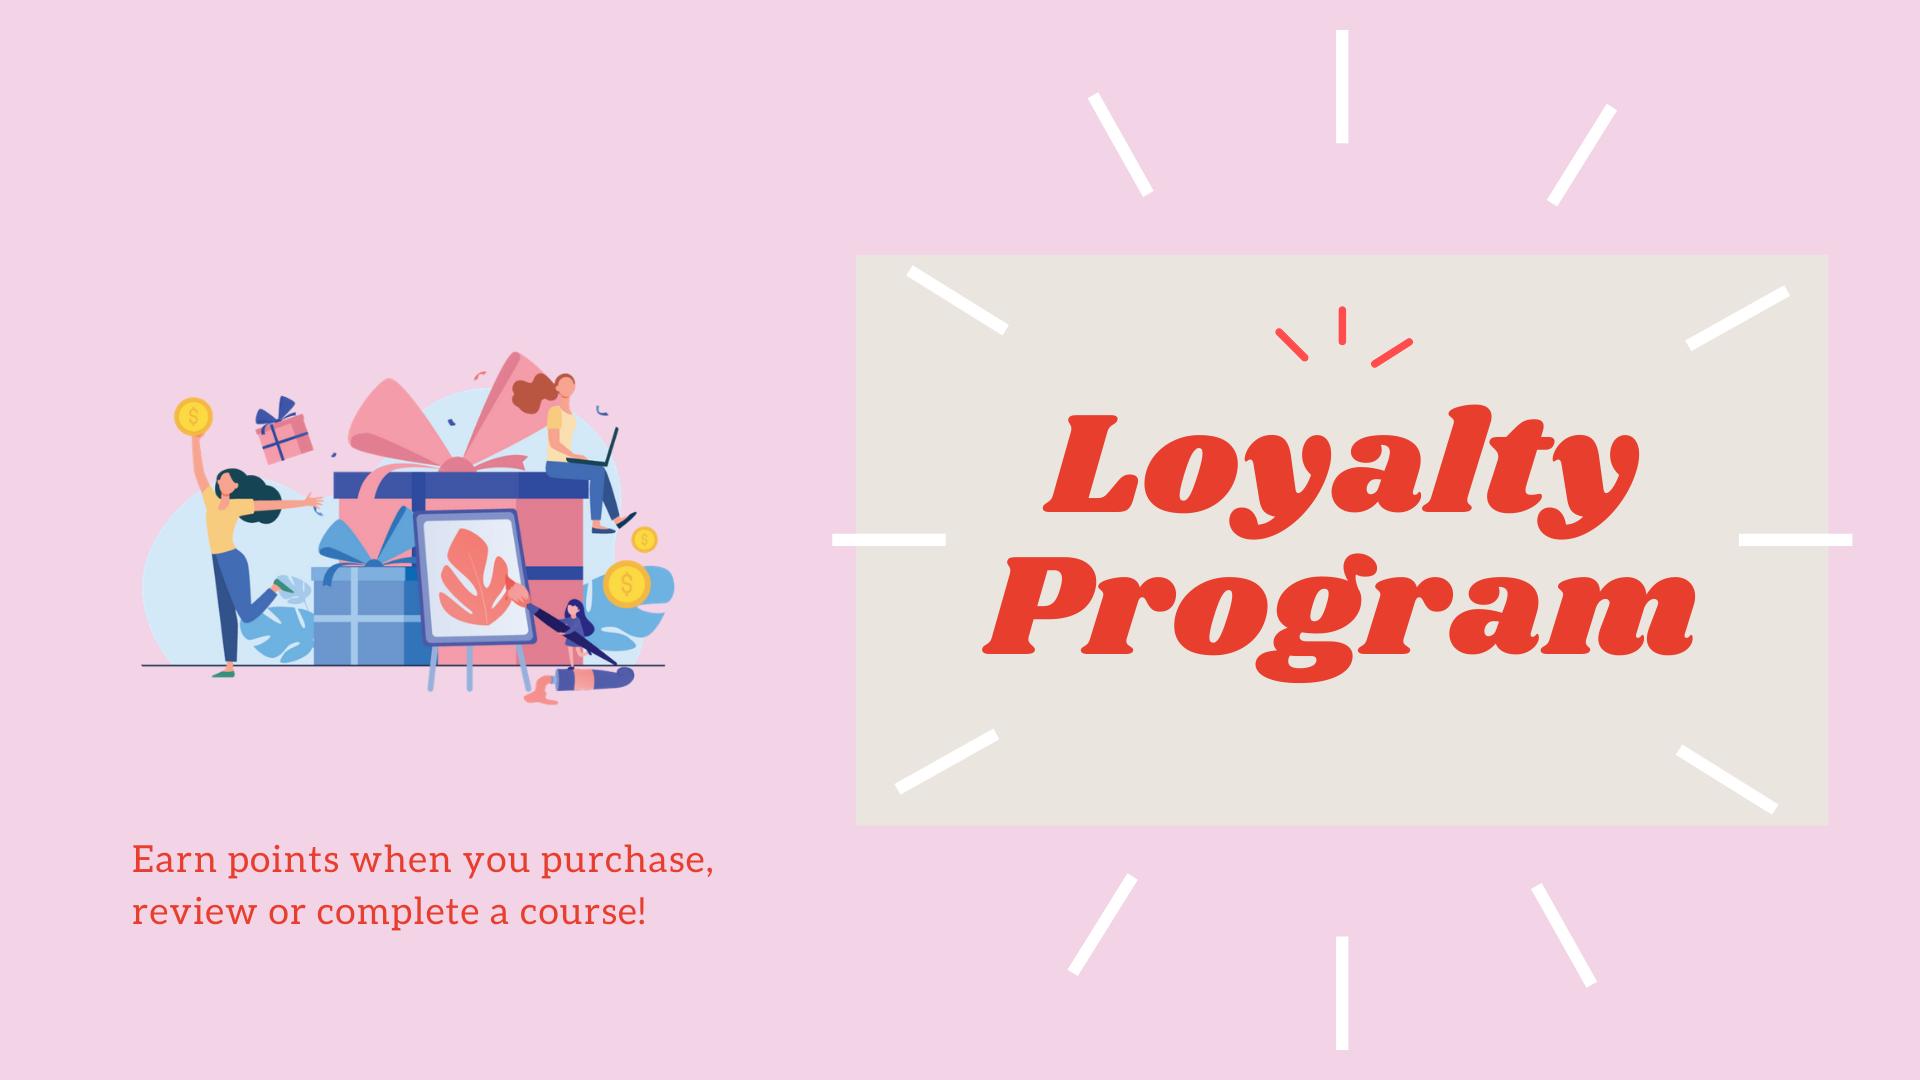 Loyalty, Craft La, Points, Crafts